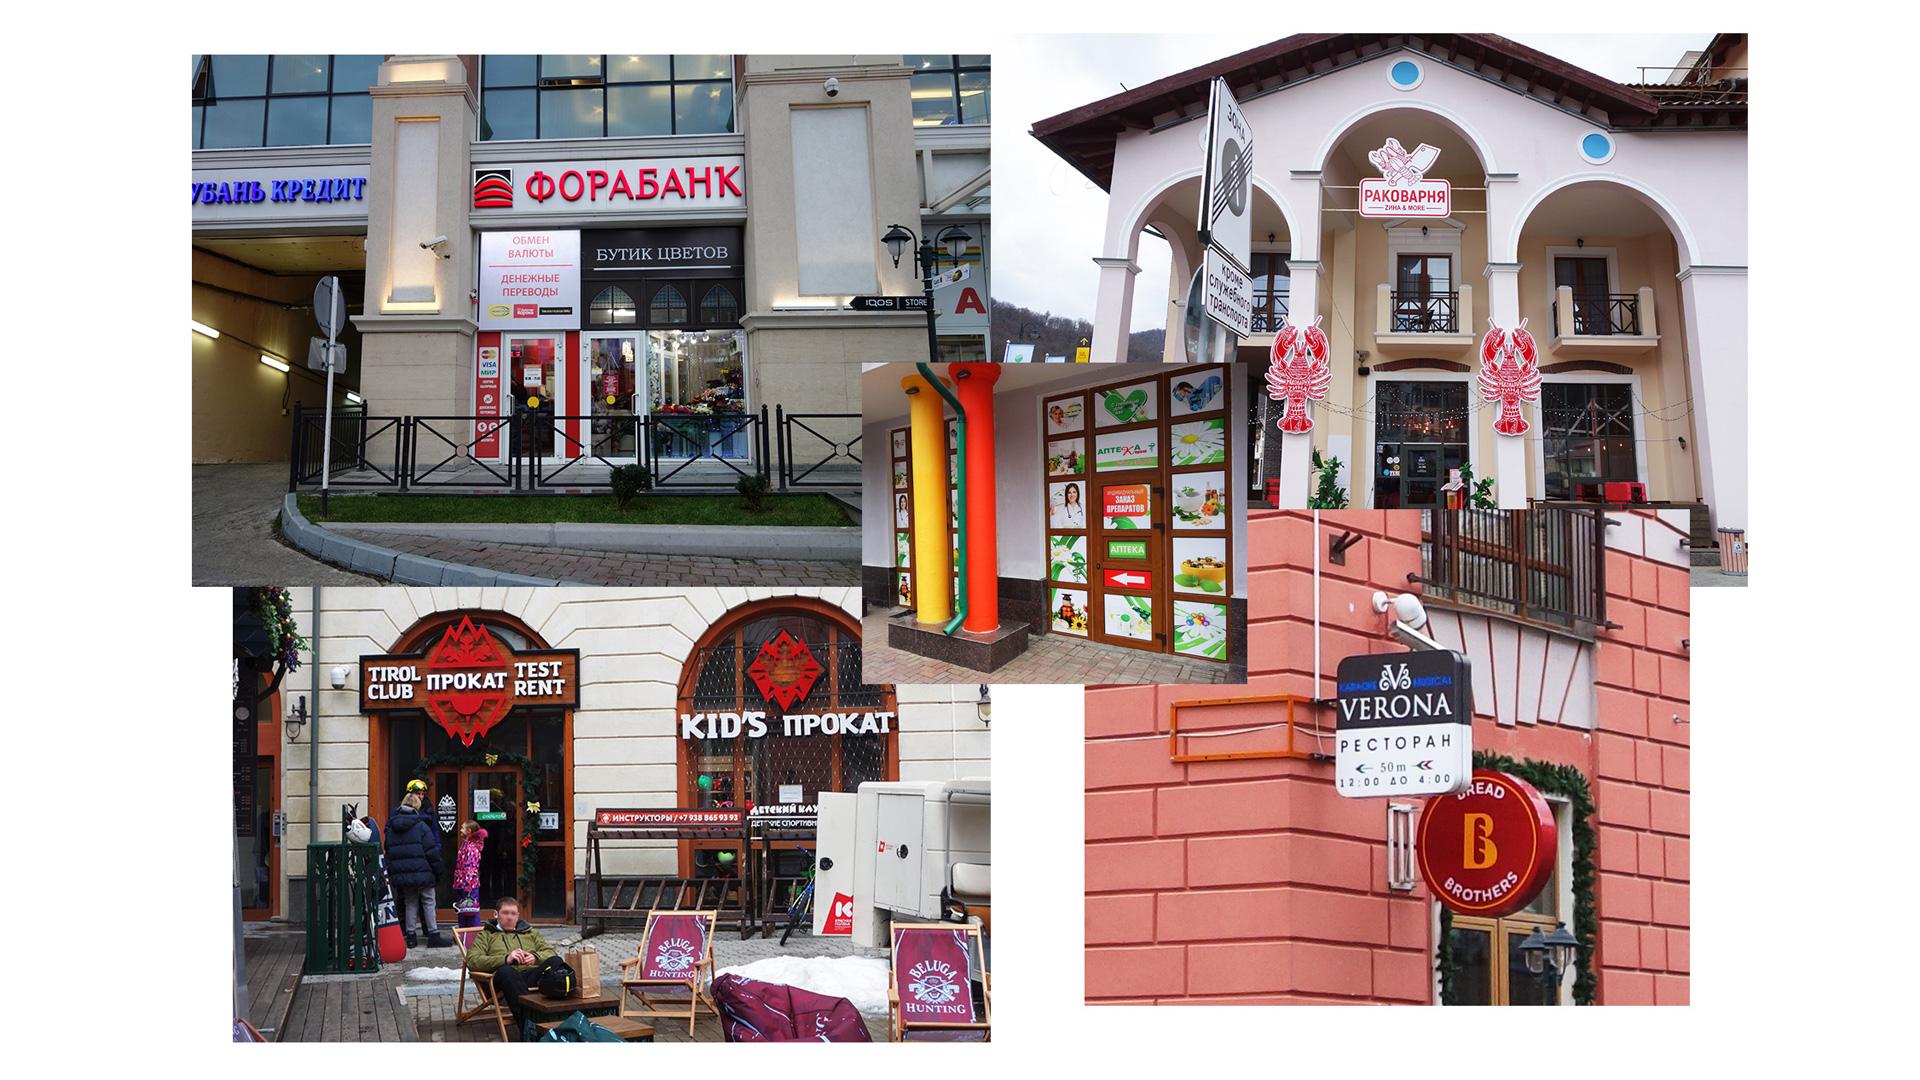 Асгард Брендинг, Красная Поляна, Курорт Красная Поляна, дизайн-код, реклама, рекламная экология